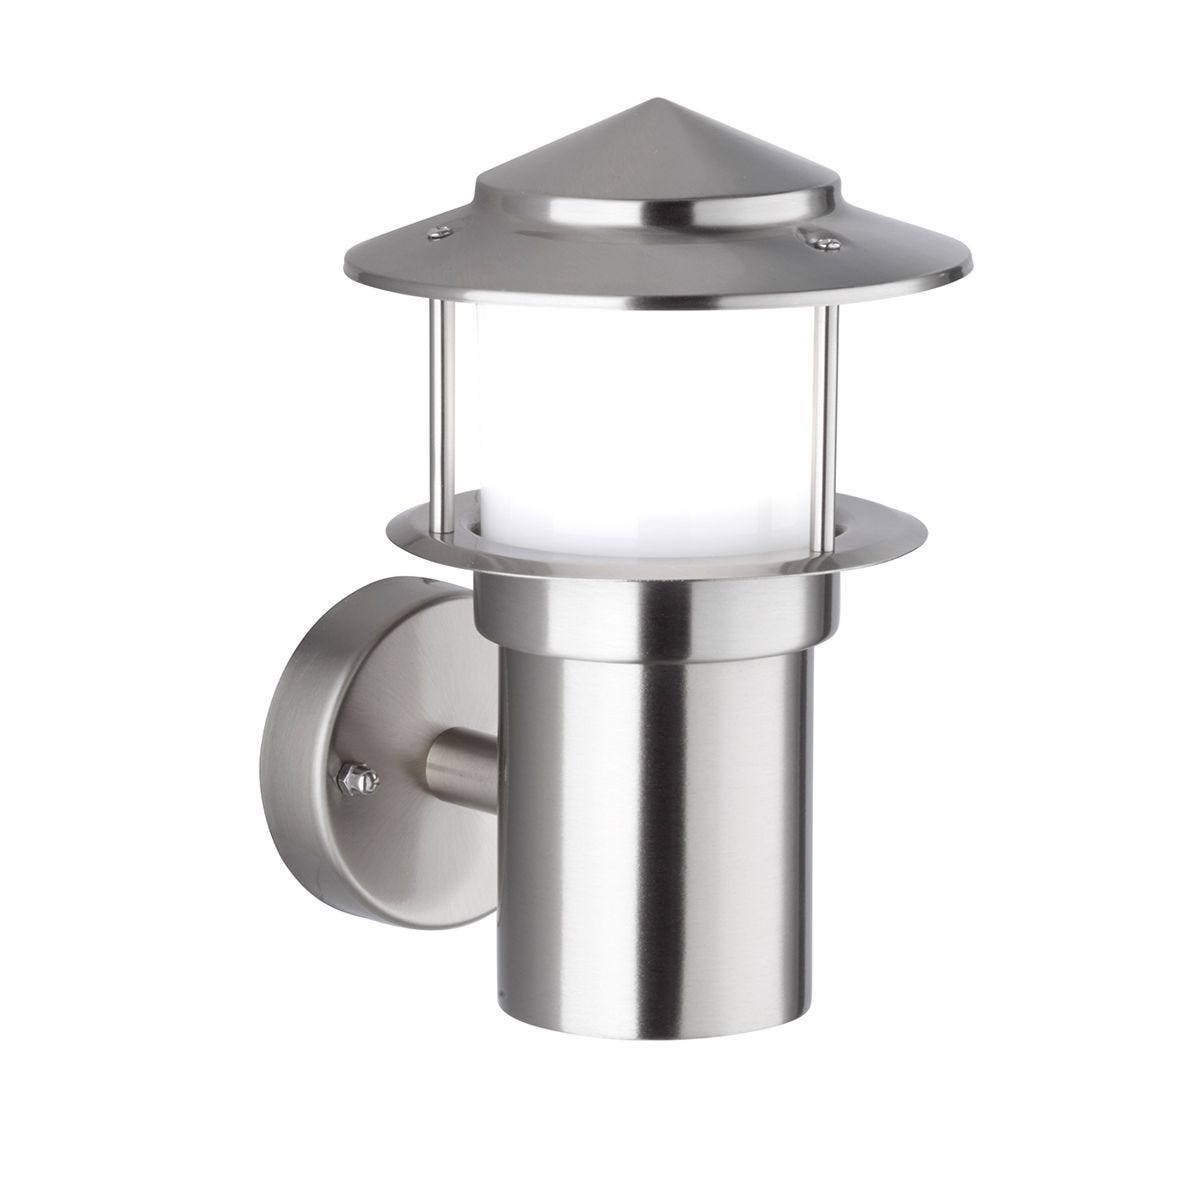 Wofi Salerno Wall Lamp - Stainless Steel